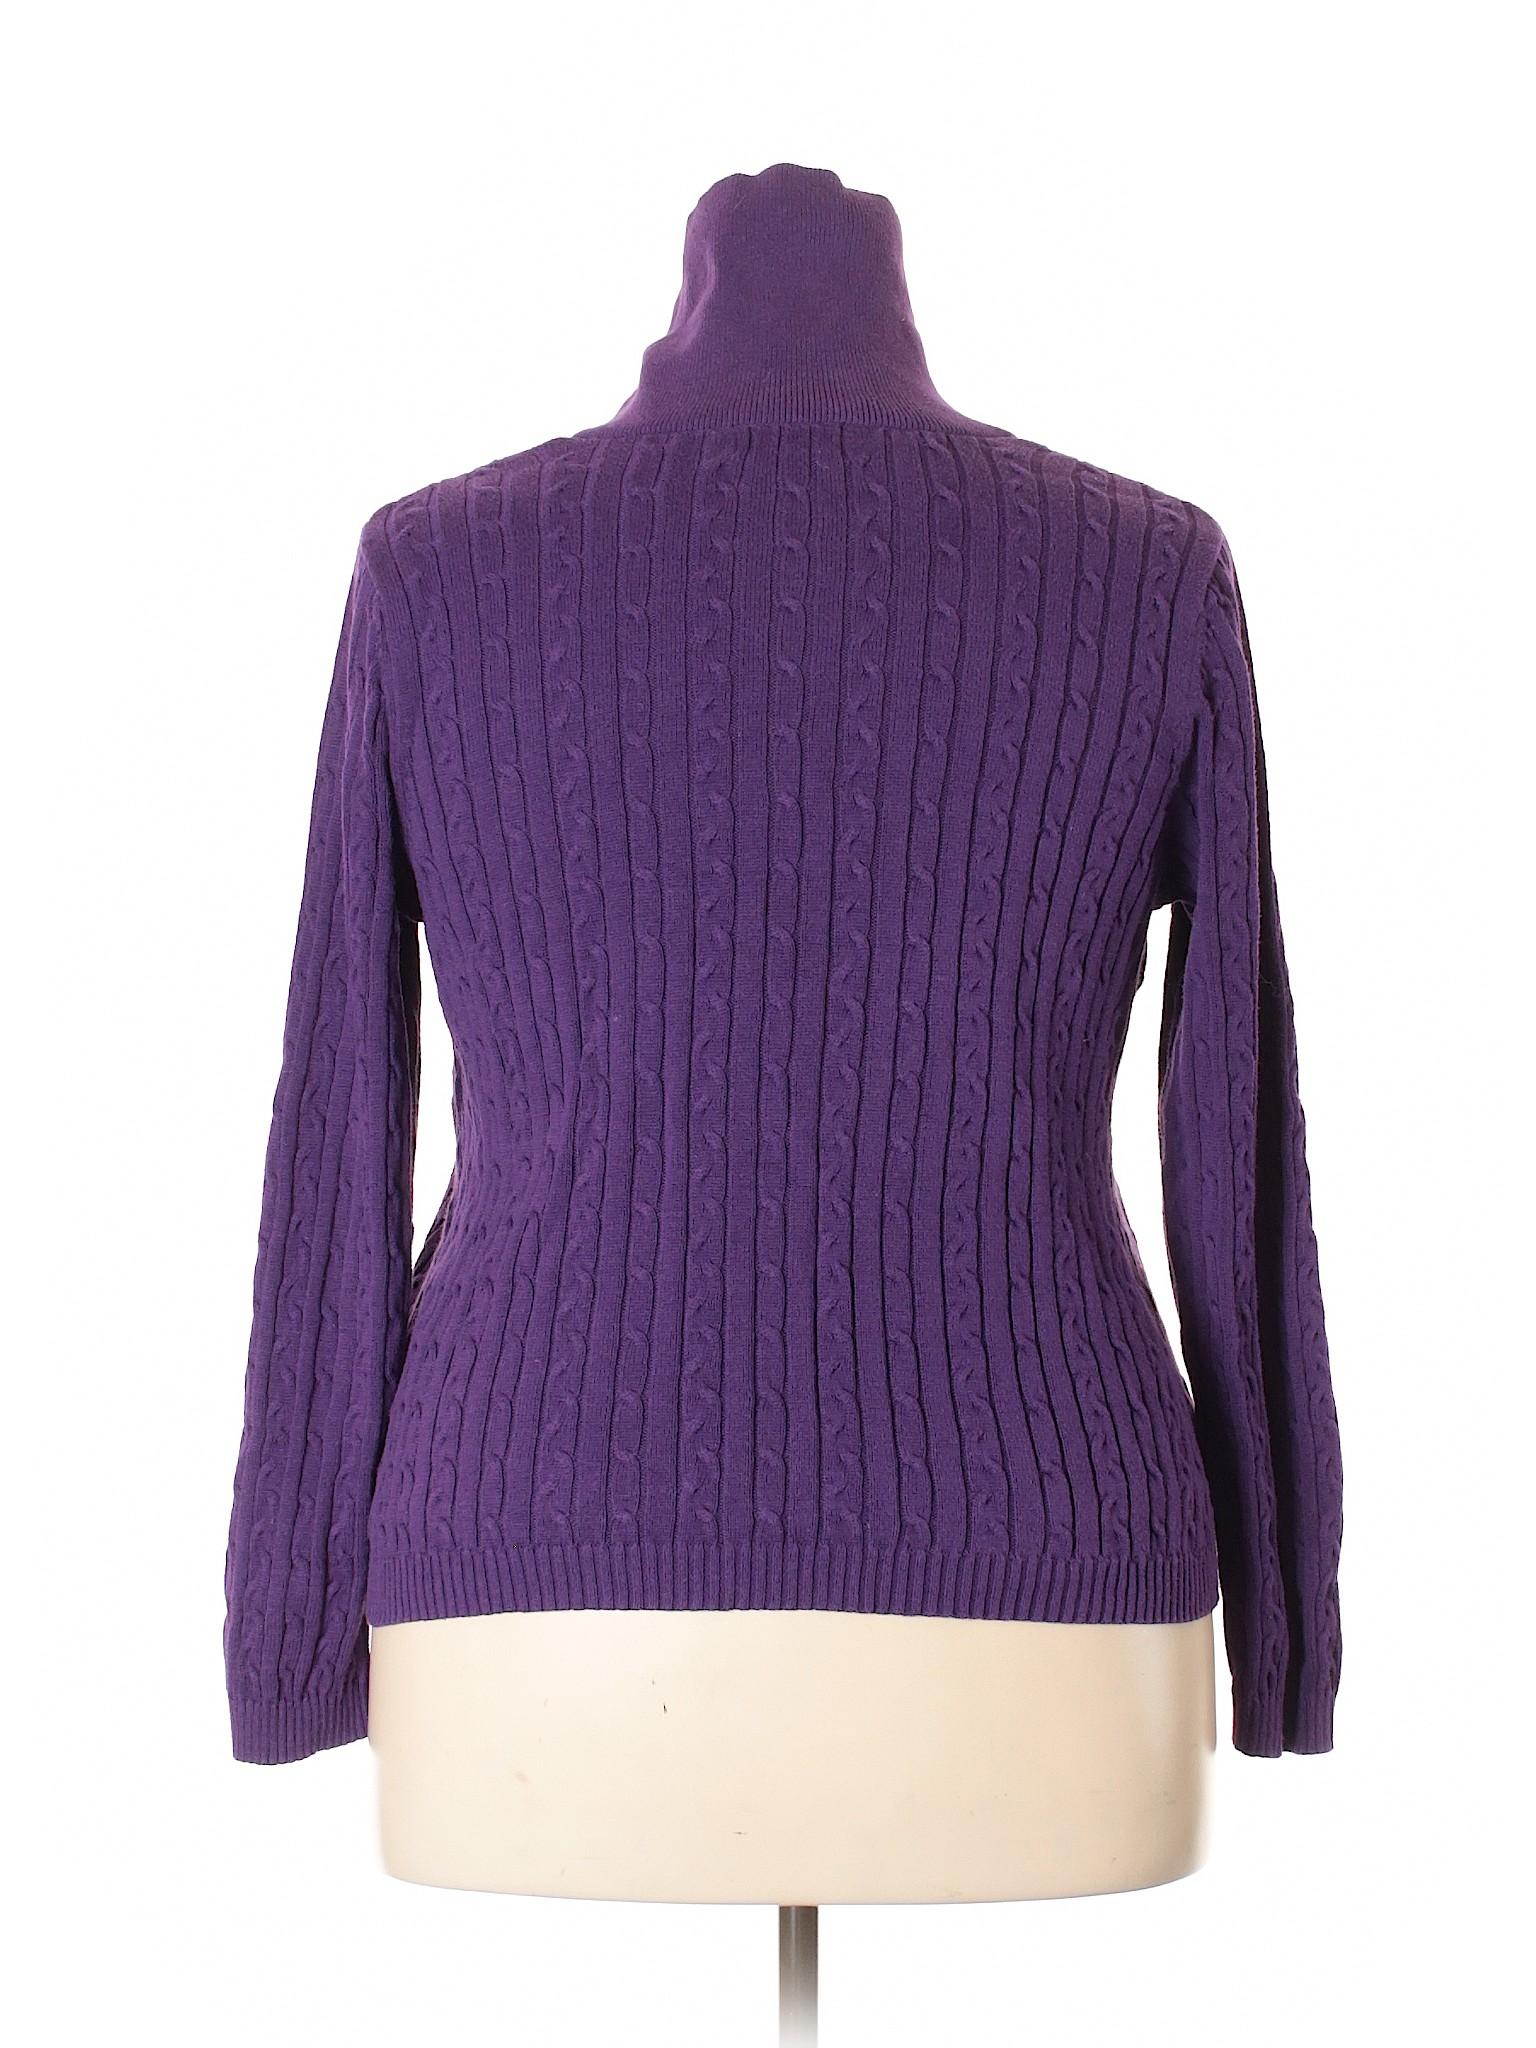 Boutique Boutique Pullover Sweater Studio Studio Works x1zBx